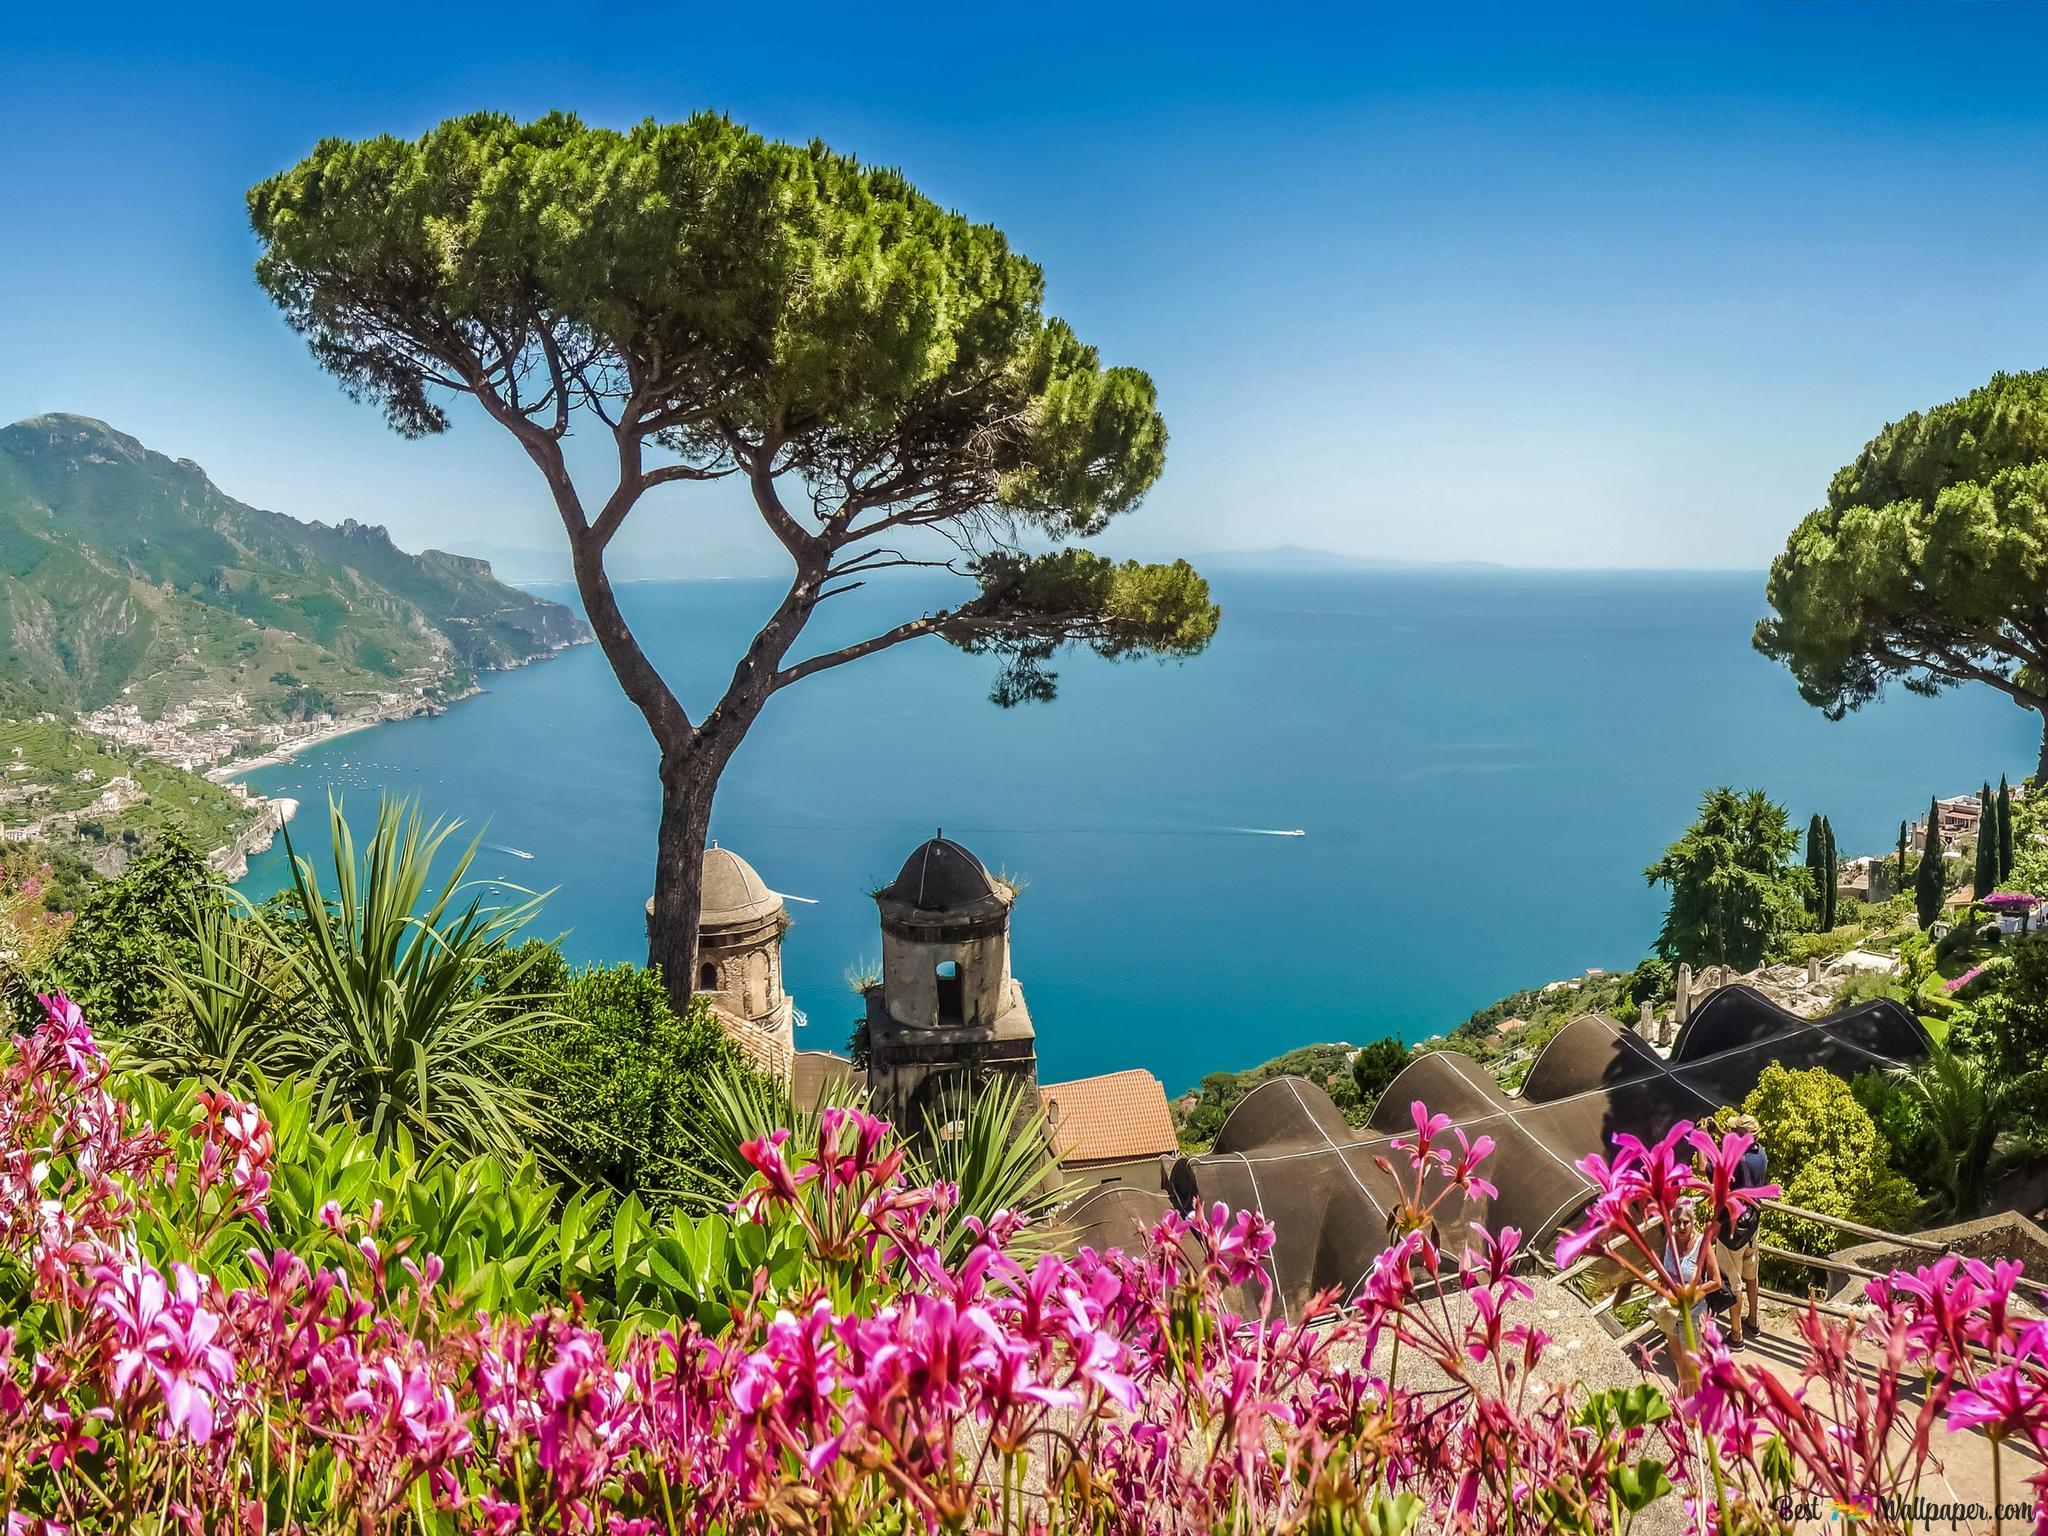 Amalfi Coastline Italy Hd Wallpaper Download